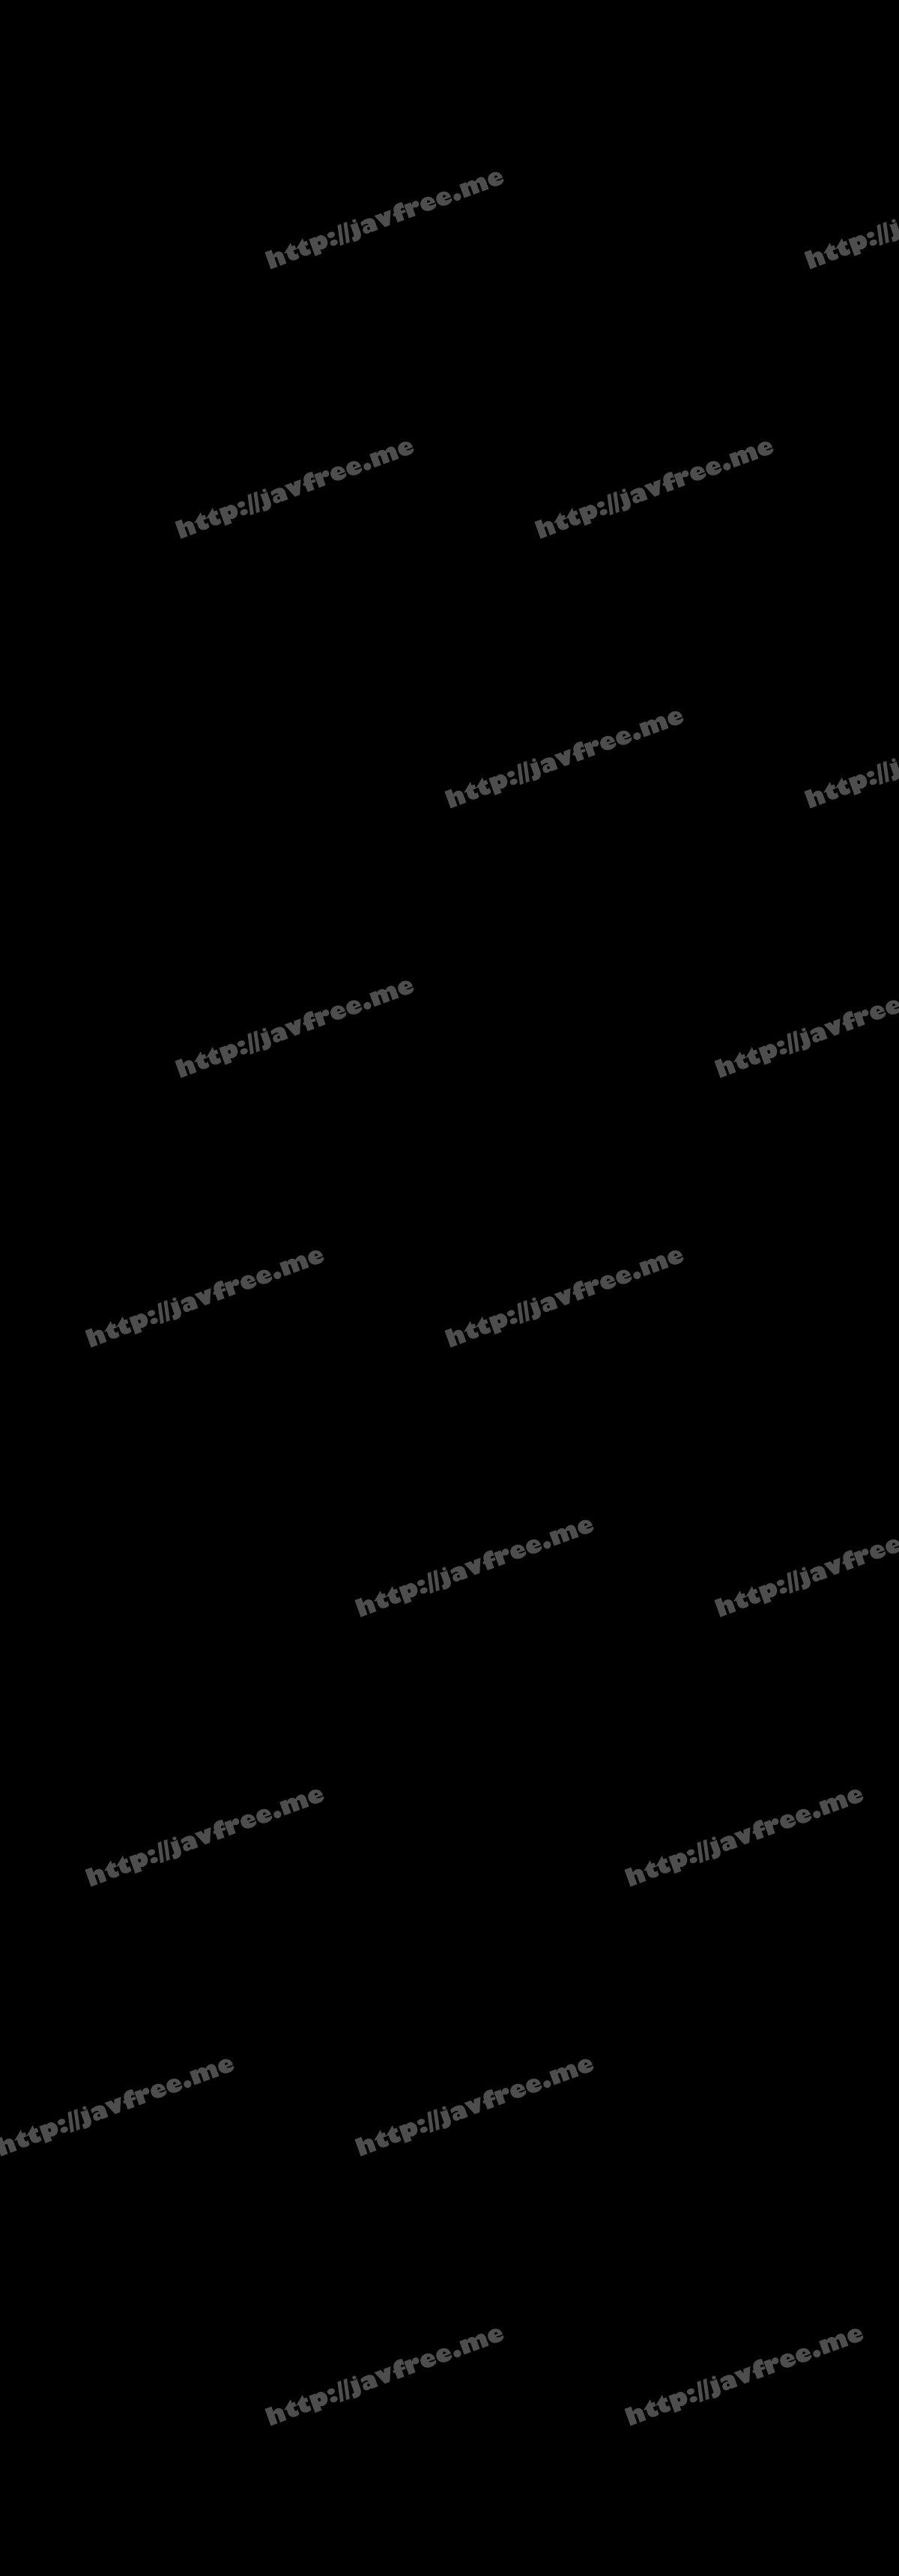 [HD][PAKO-013] 日常的な近親相姦NTR - image pacopacomama-100119_181 on https://javfree.me